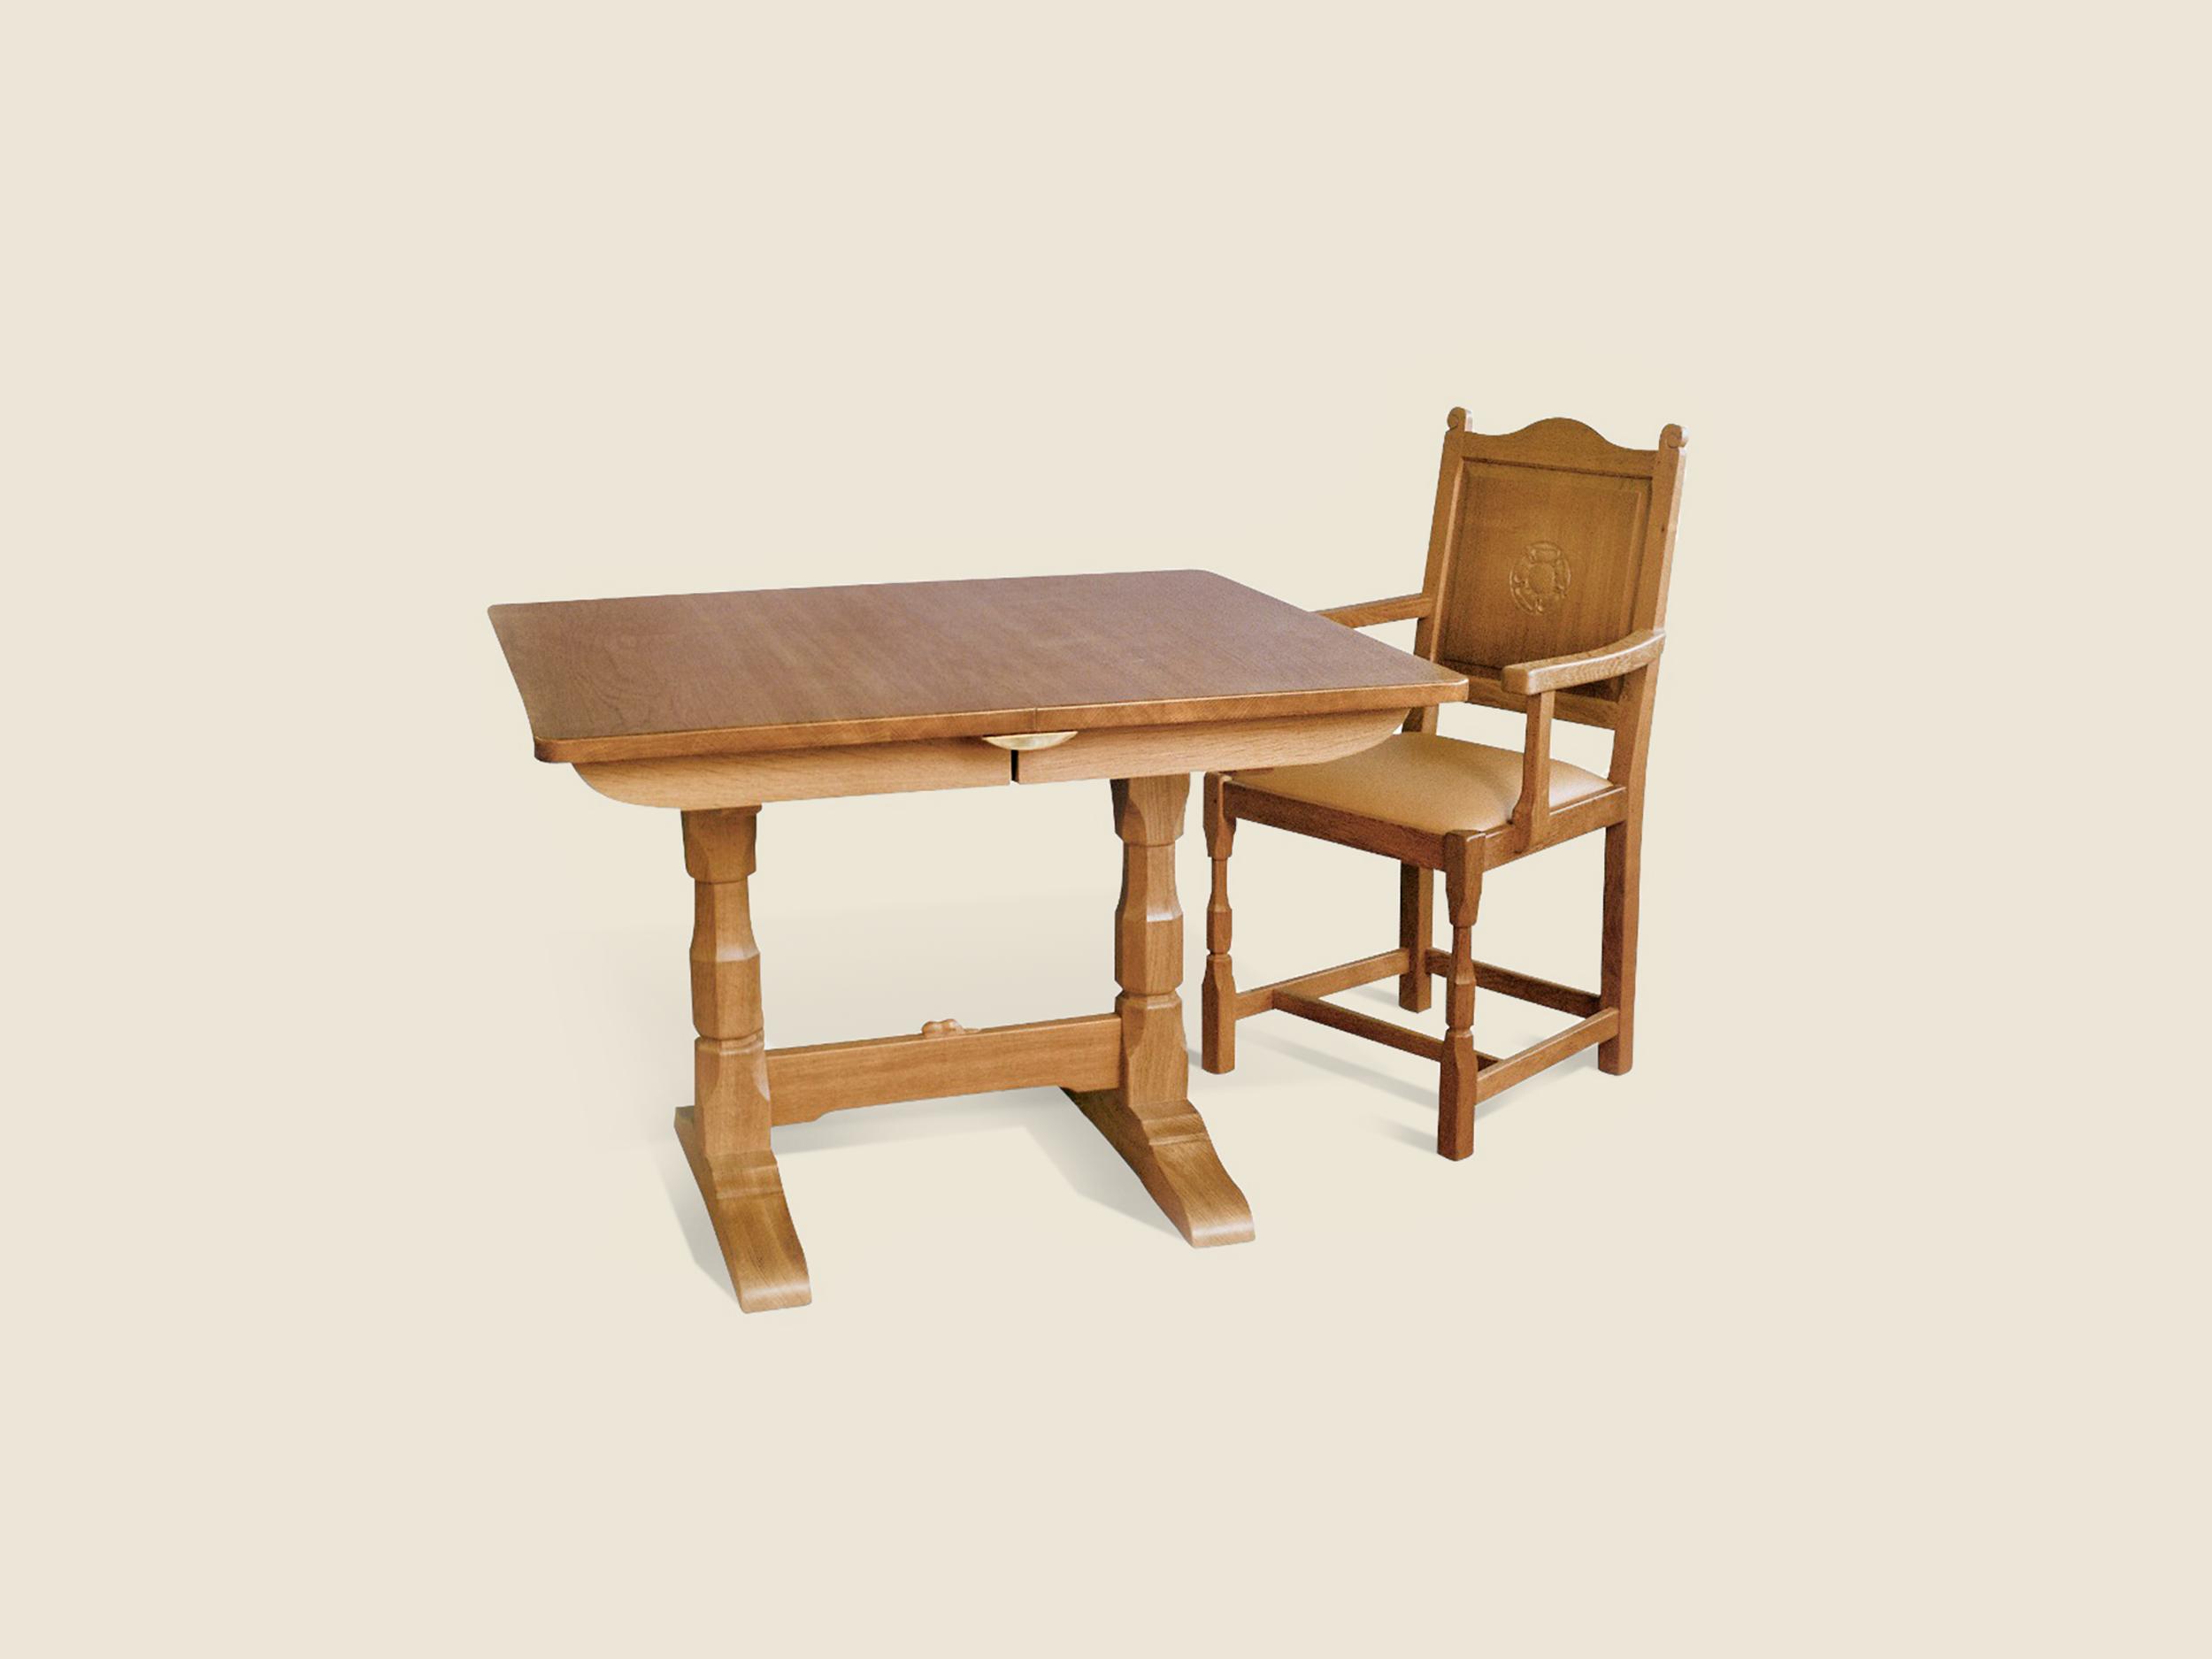 bf106_beaver_furnituremakers_extending_oak_table_similar_to_mouseman.png